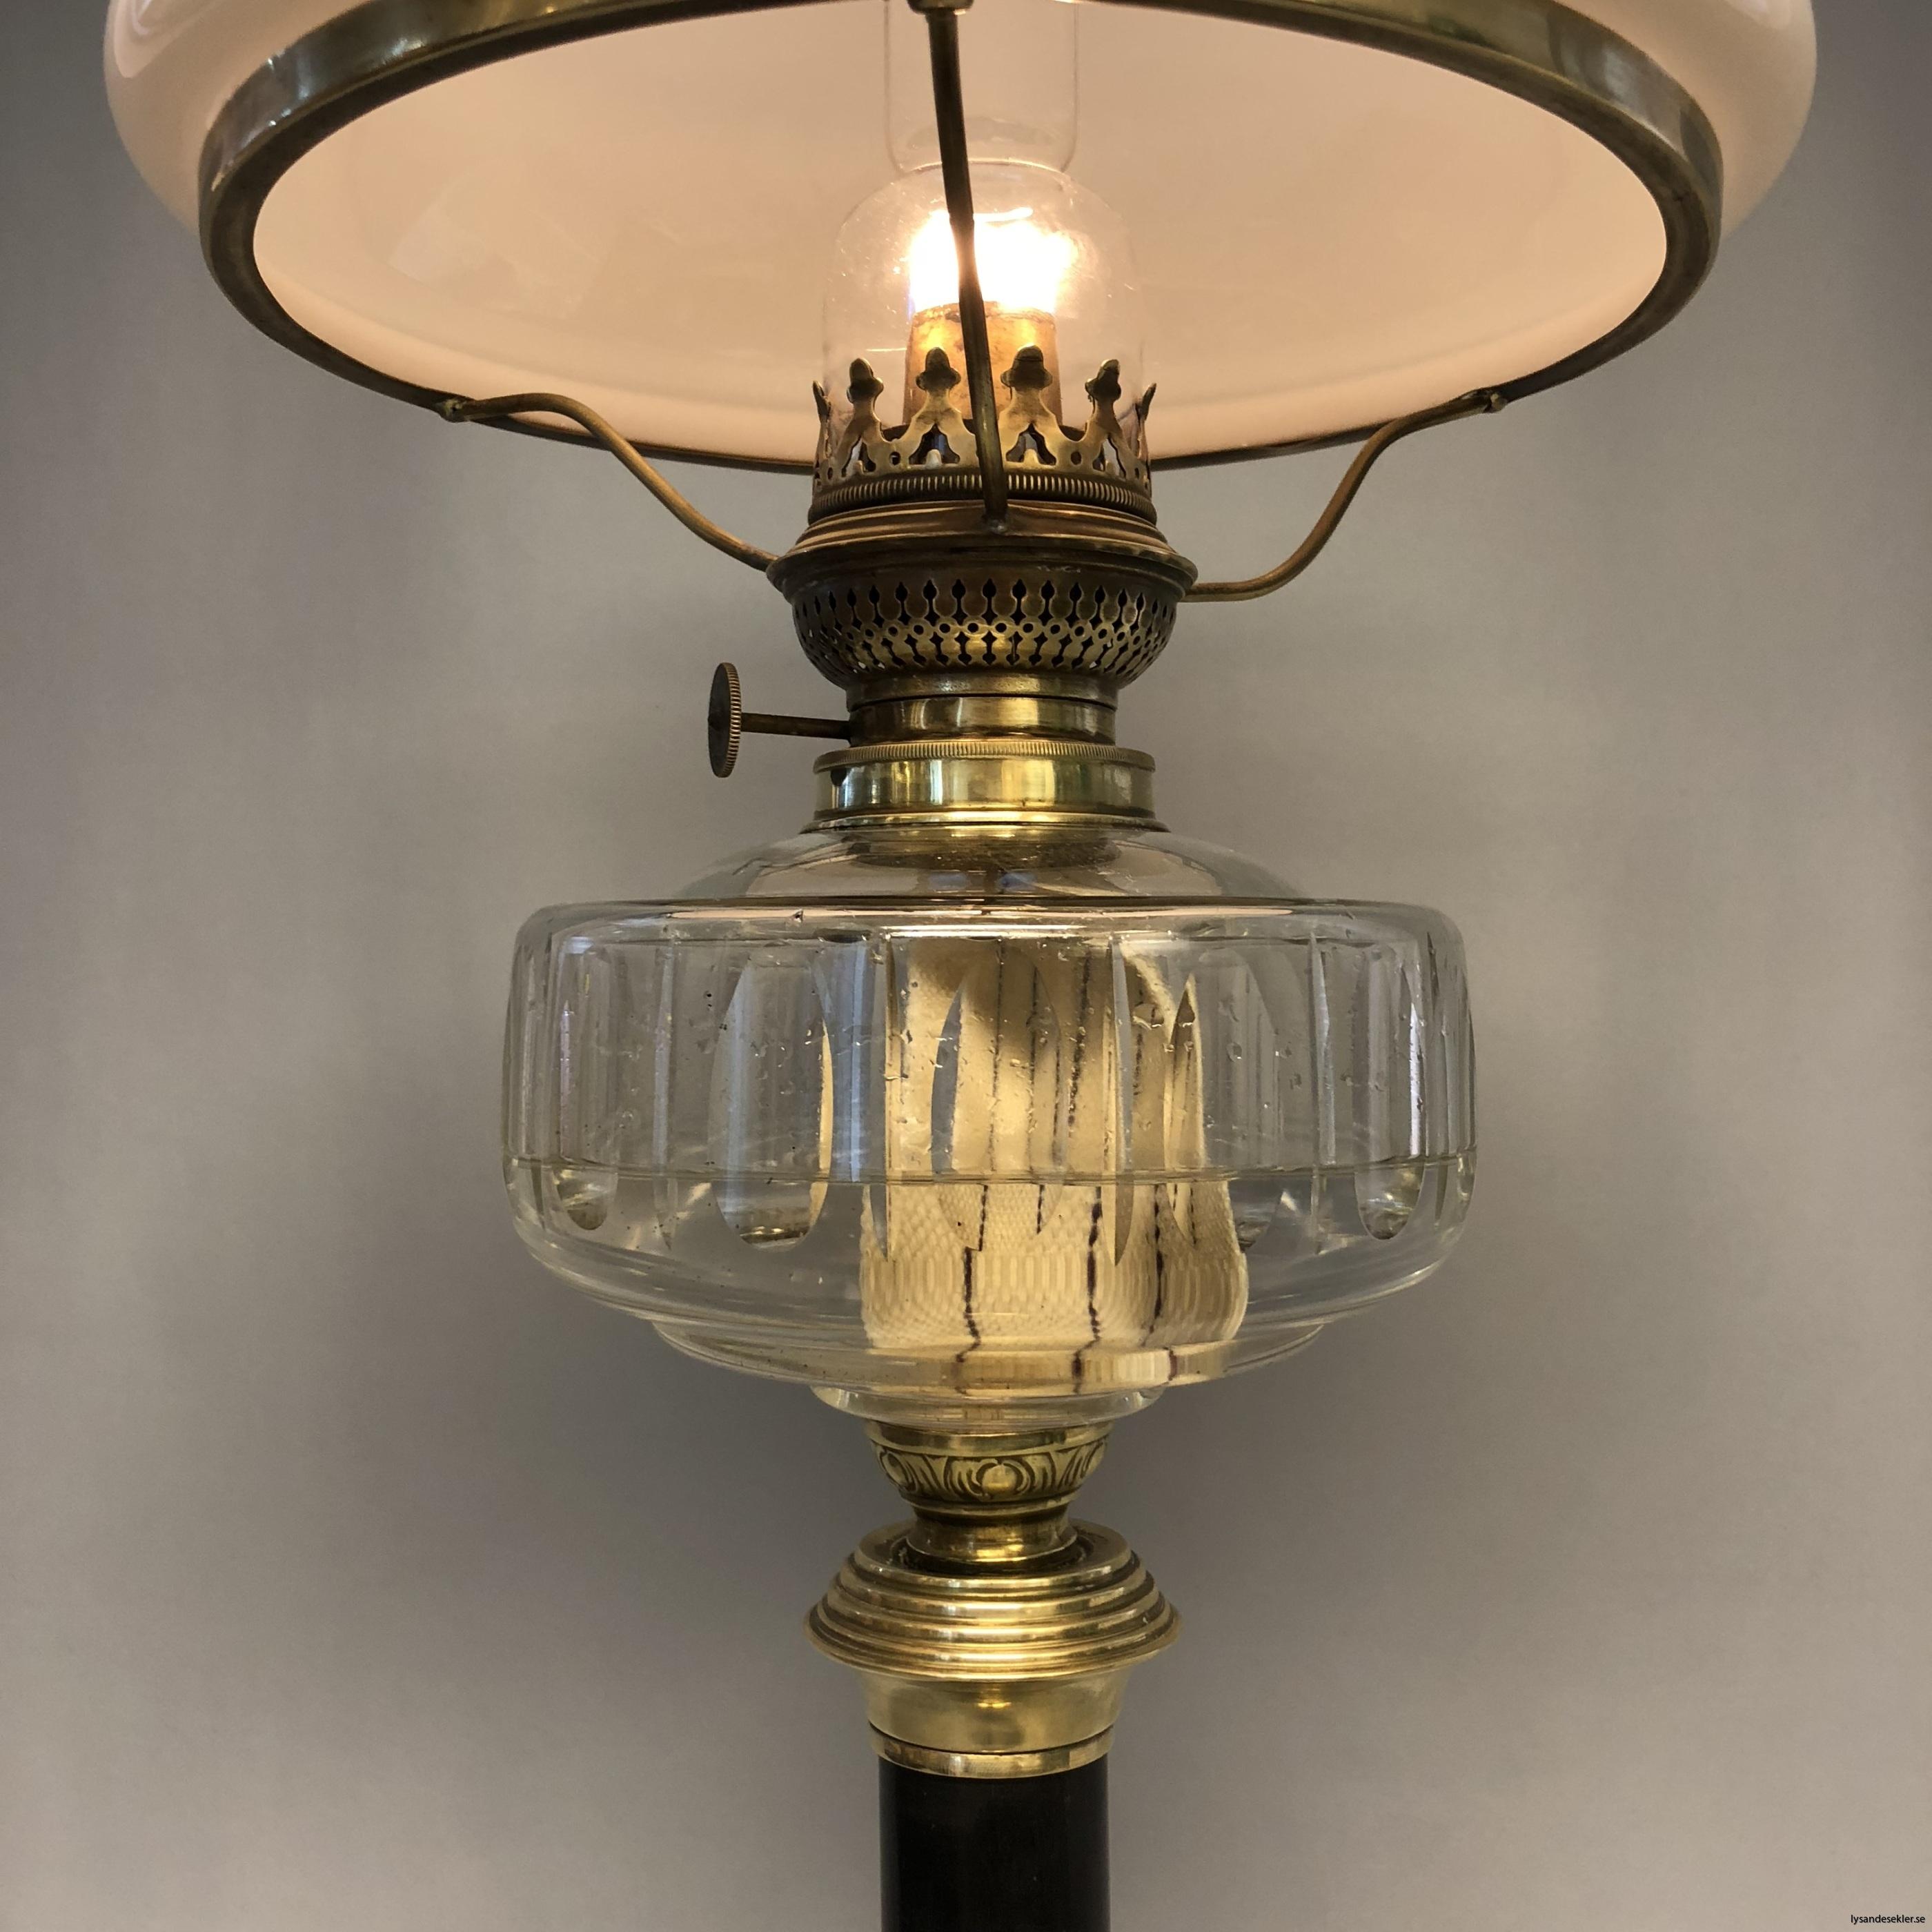 fotogenlampa fotogenlampor renoverad antik151